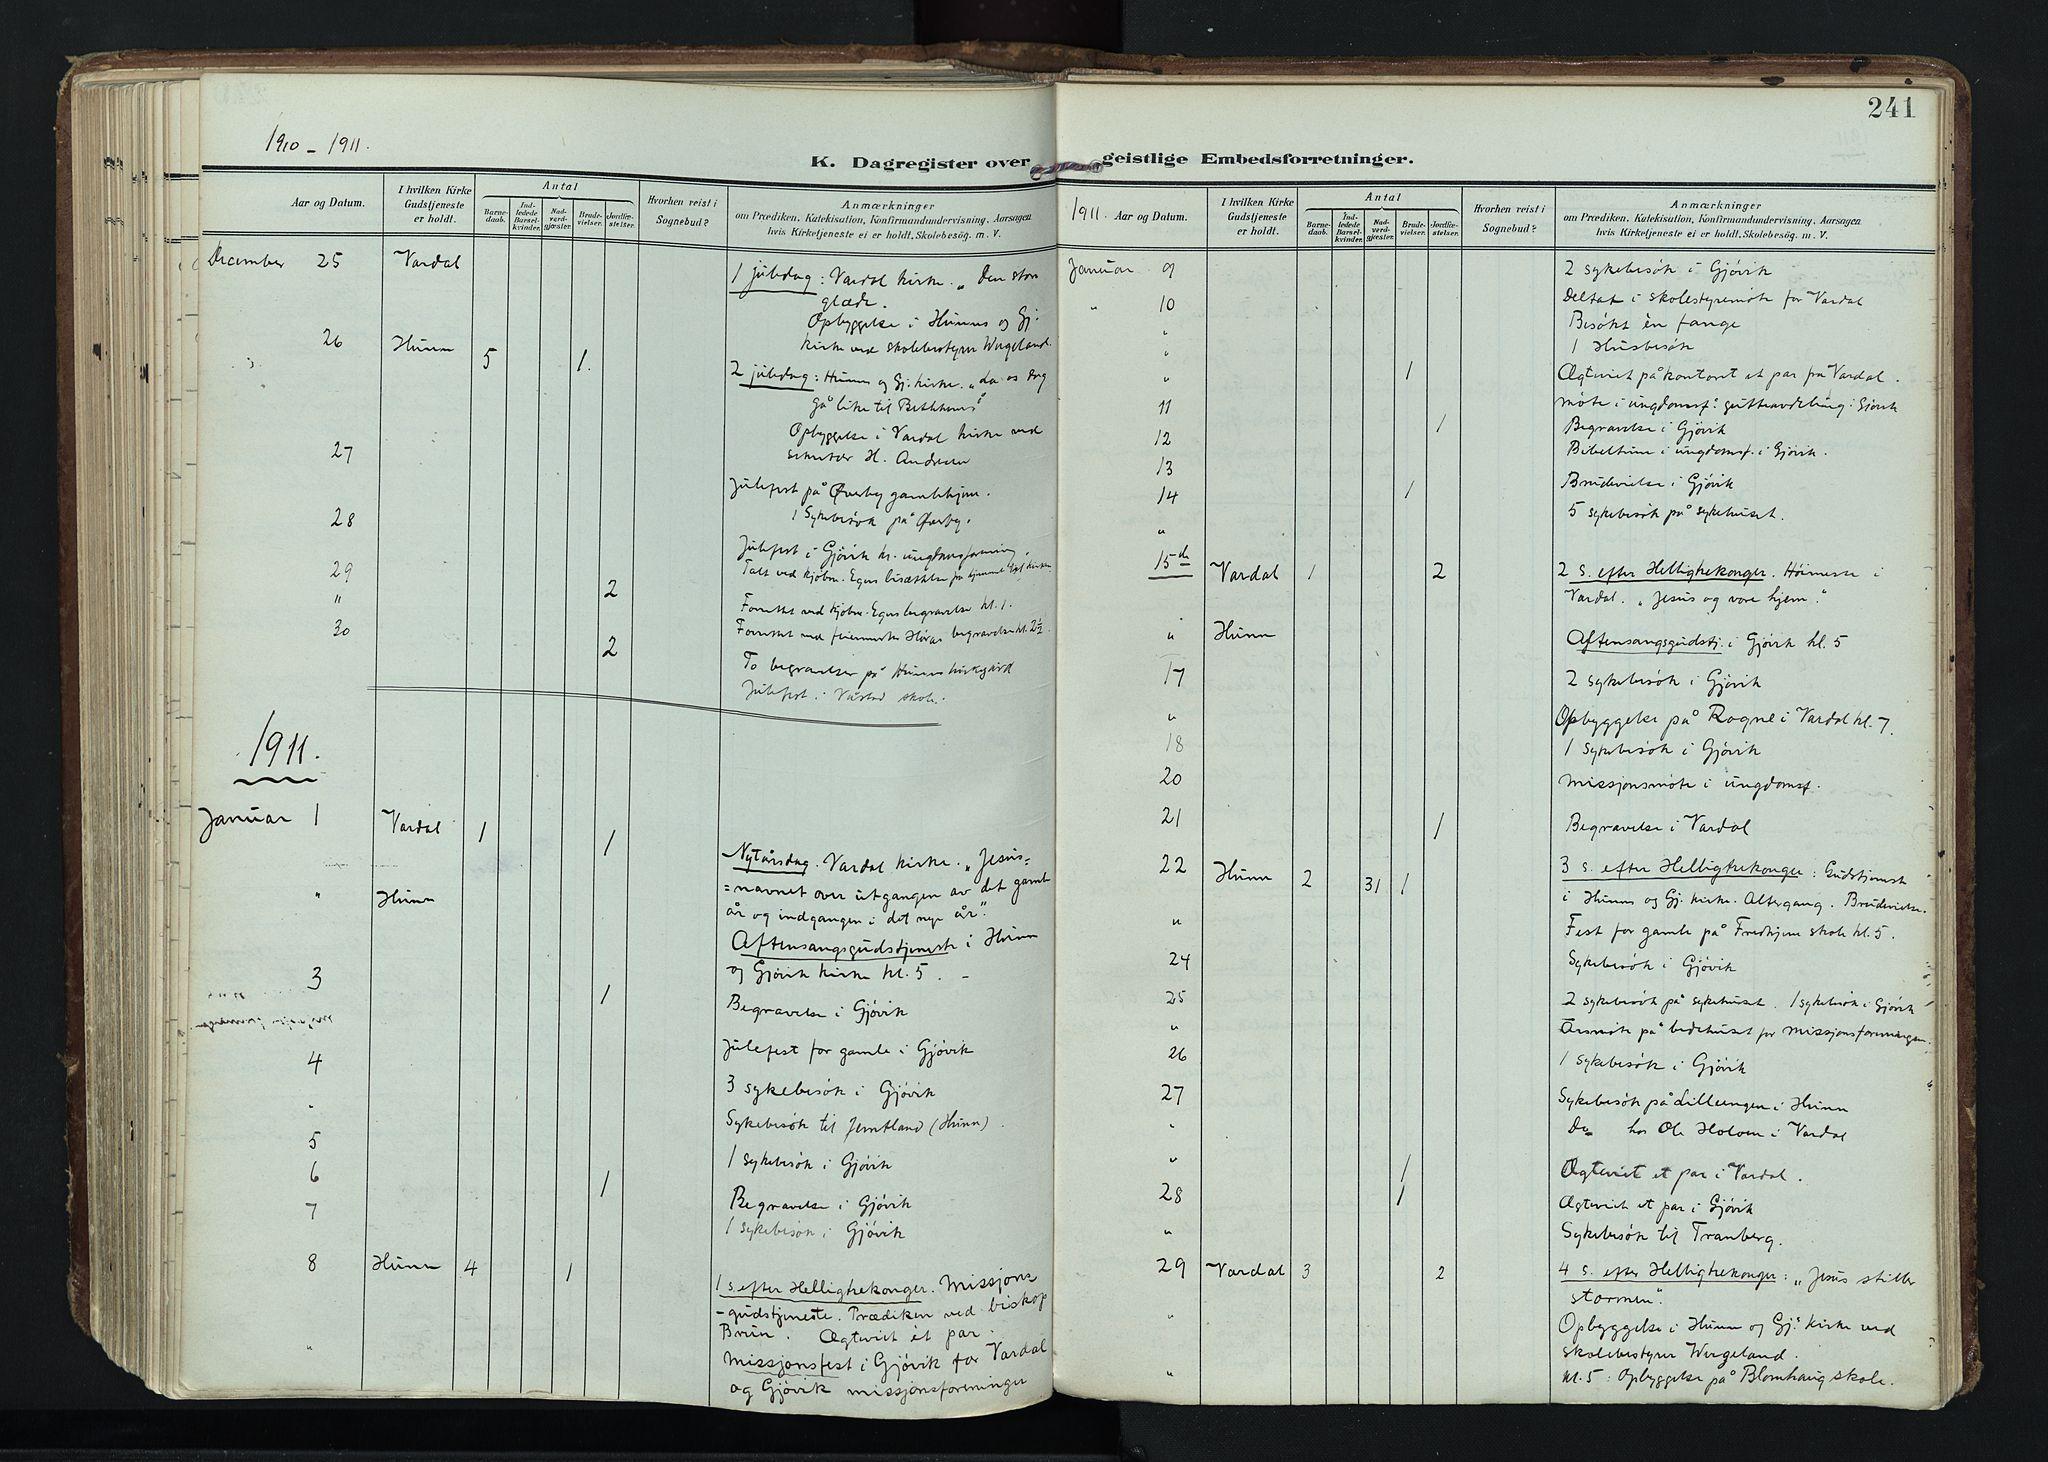 SAH, Vardal prestekontor, H/Ha/Haa/L0020: Ministerialbok nr. 20, 1907-1921, s. 241